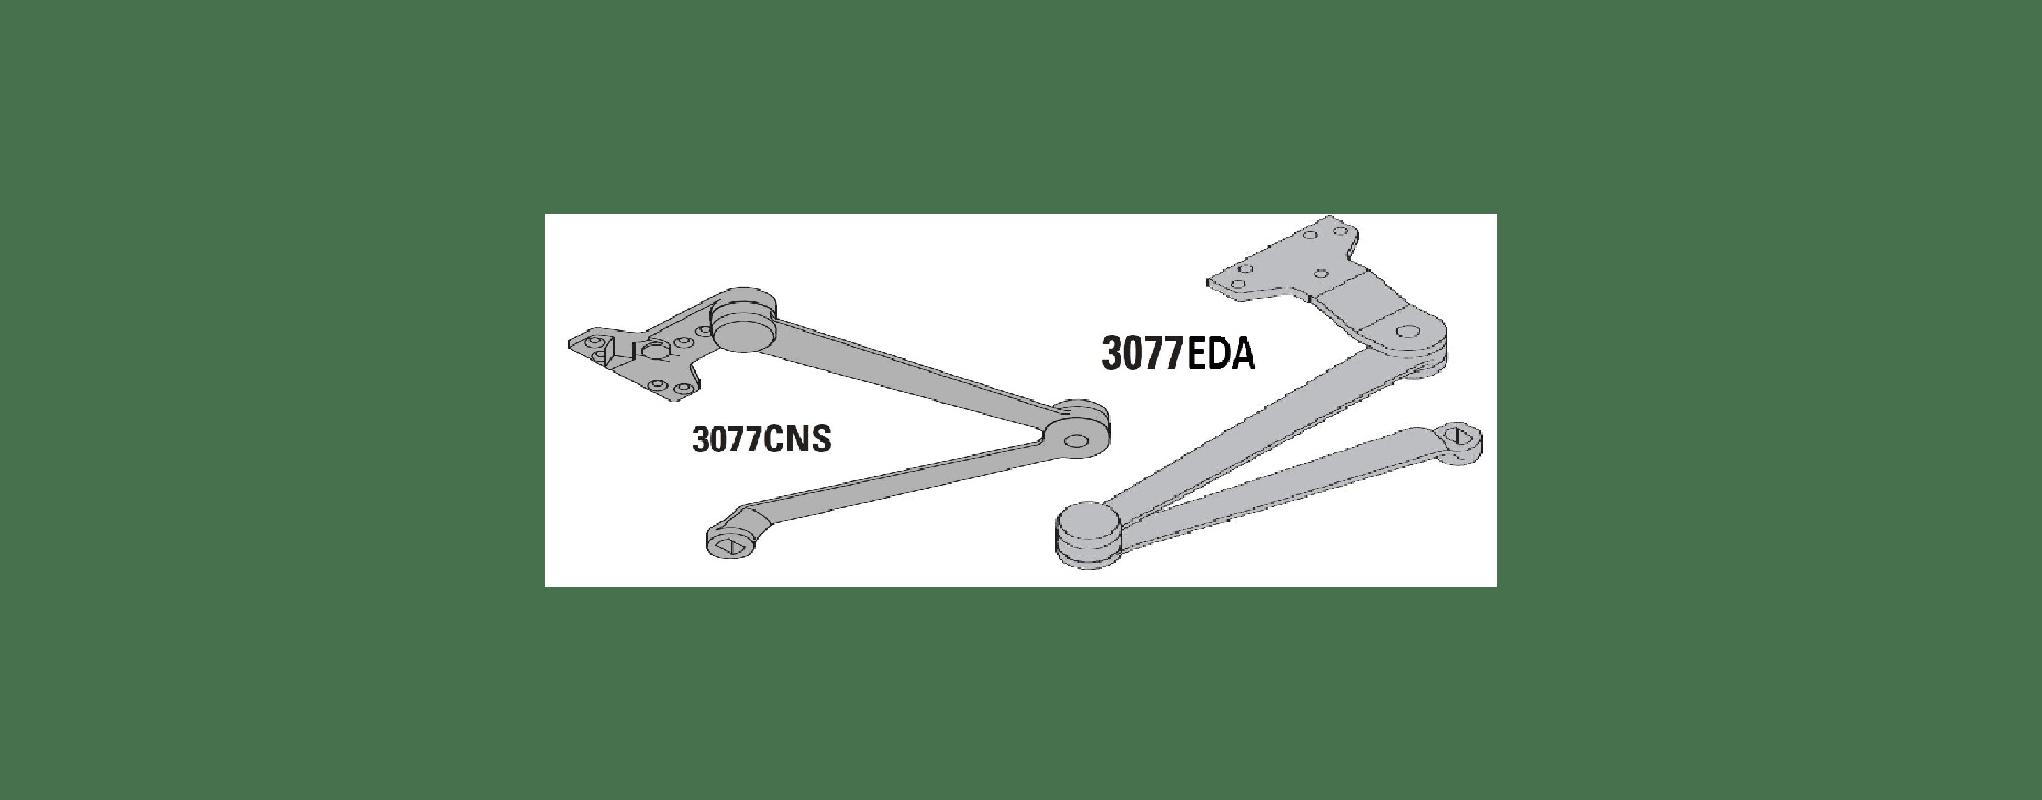 Lcn Eda Aluminum Regular Extra Duty Arm For